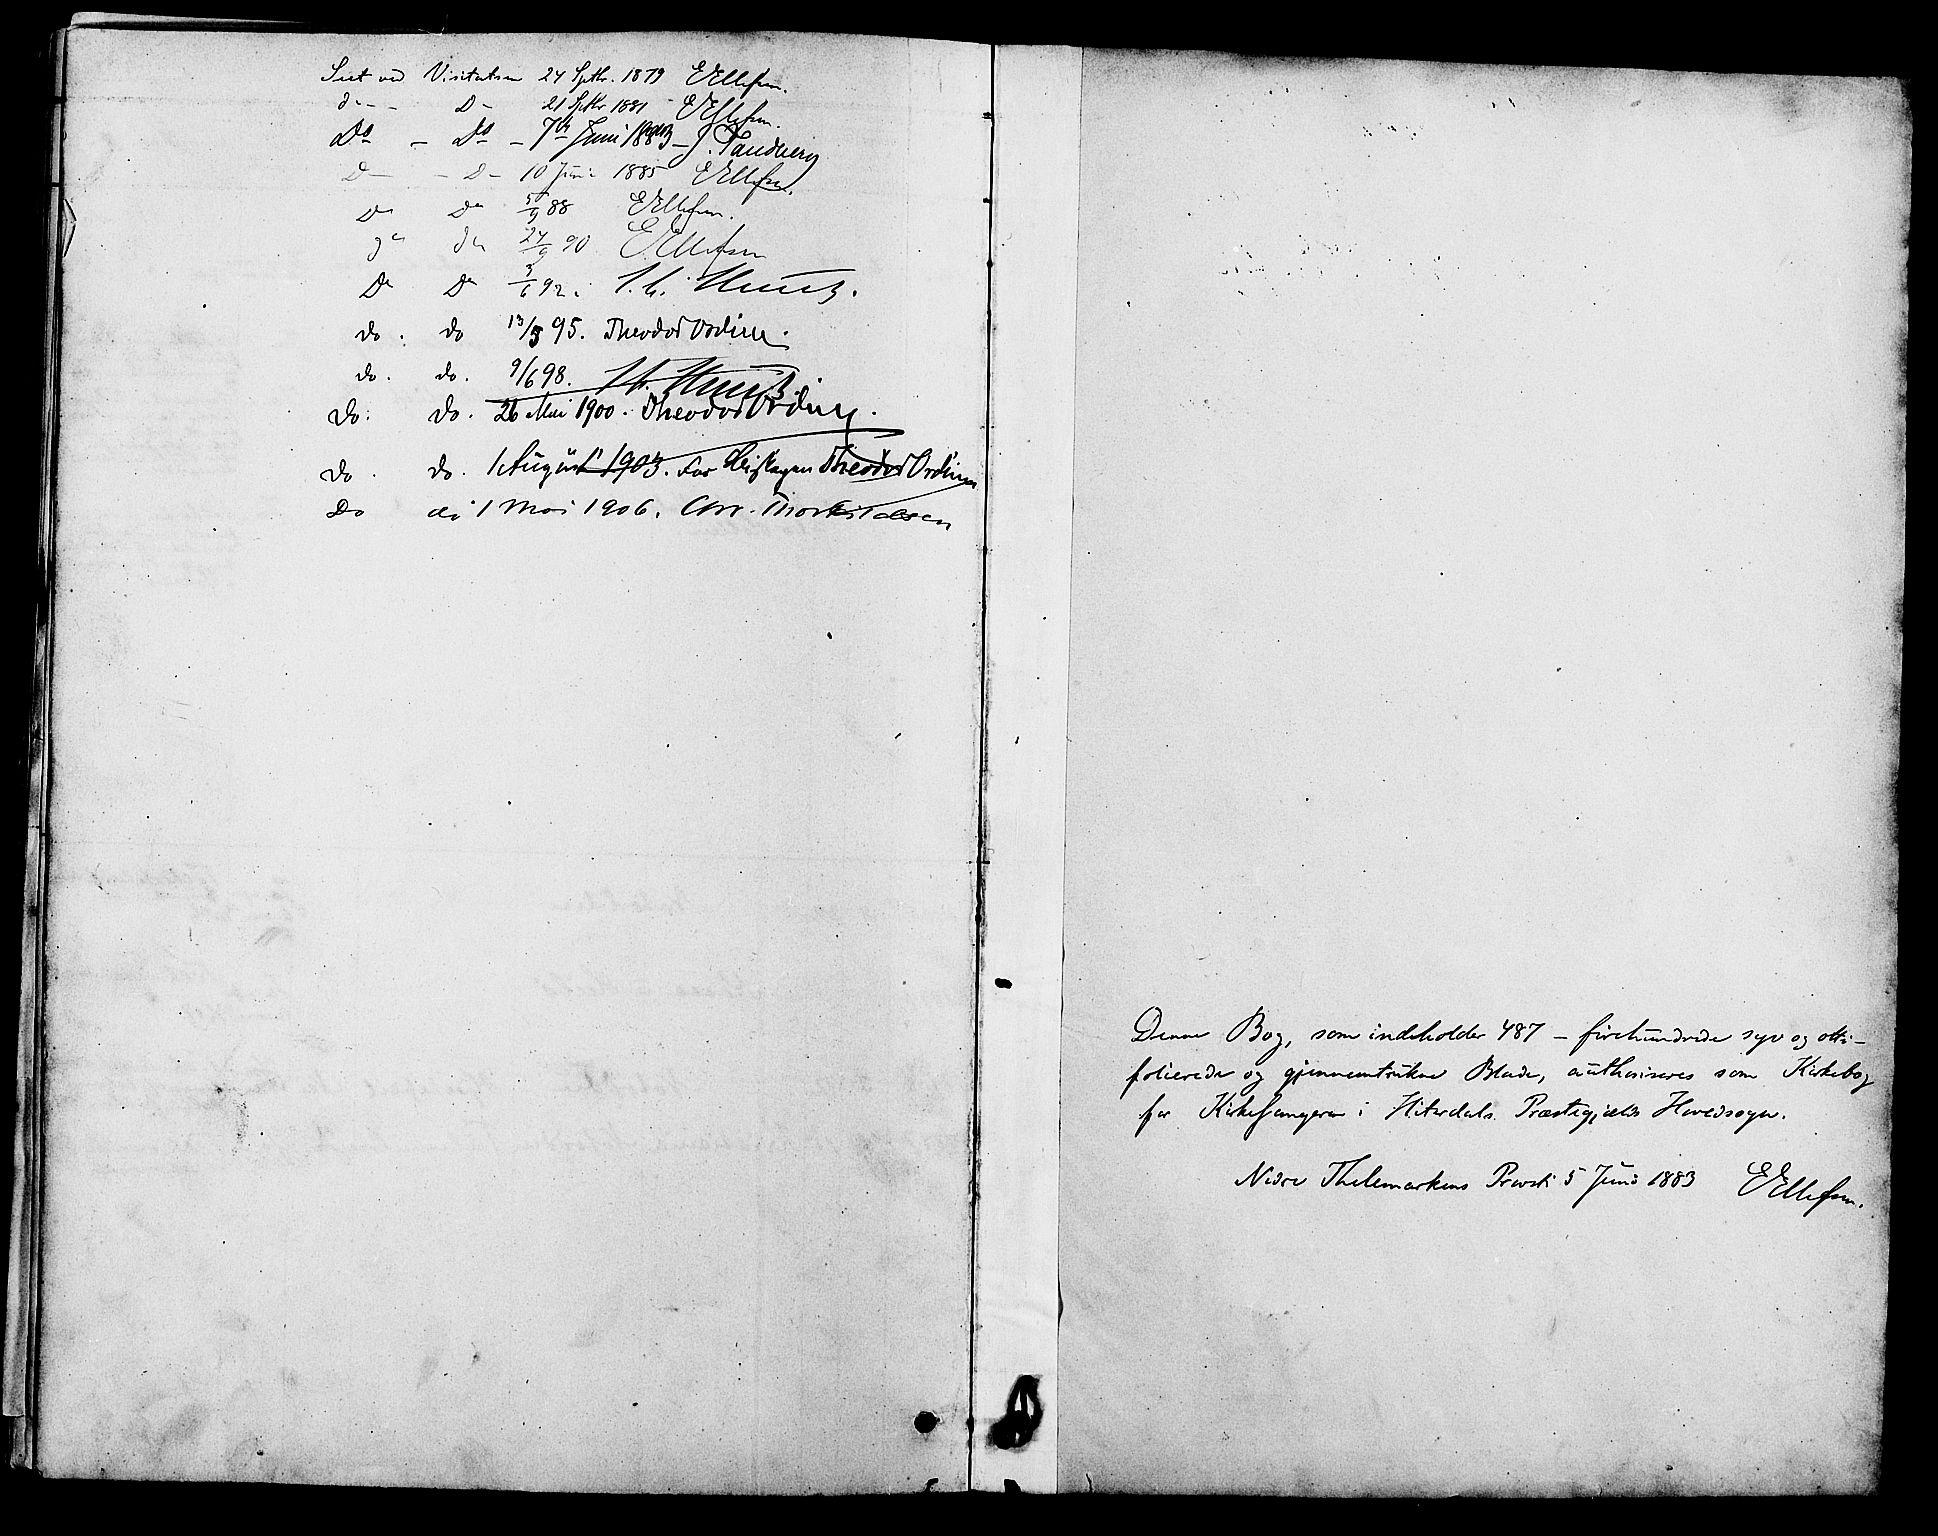 SAKO, Heddal kirkebøker, G/Ga/L0002: Klokkerbok nr. I 2, 1879-1908